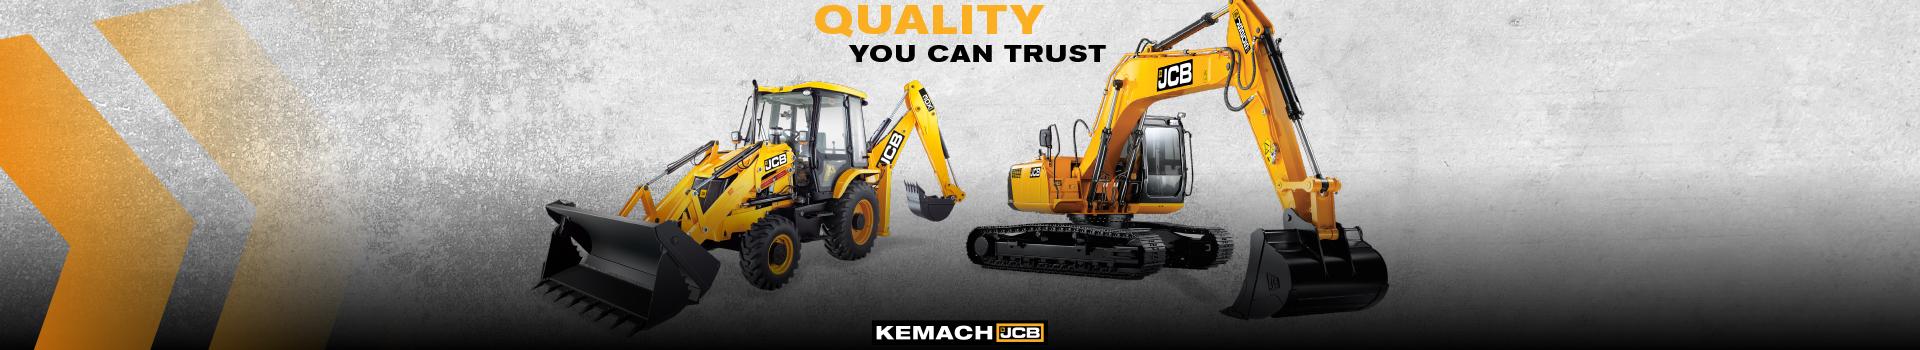 Home | Kemach Equipment JCB